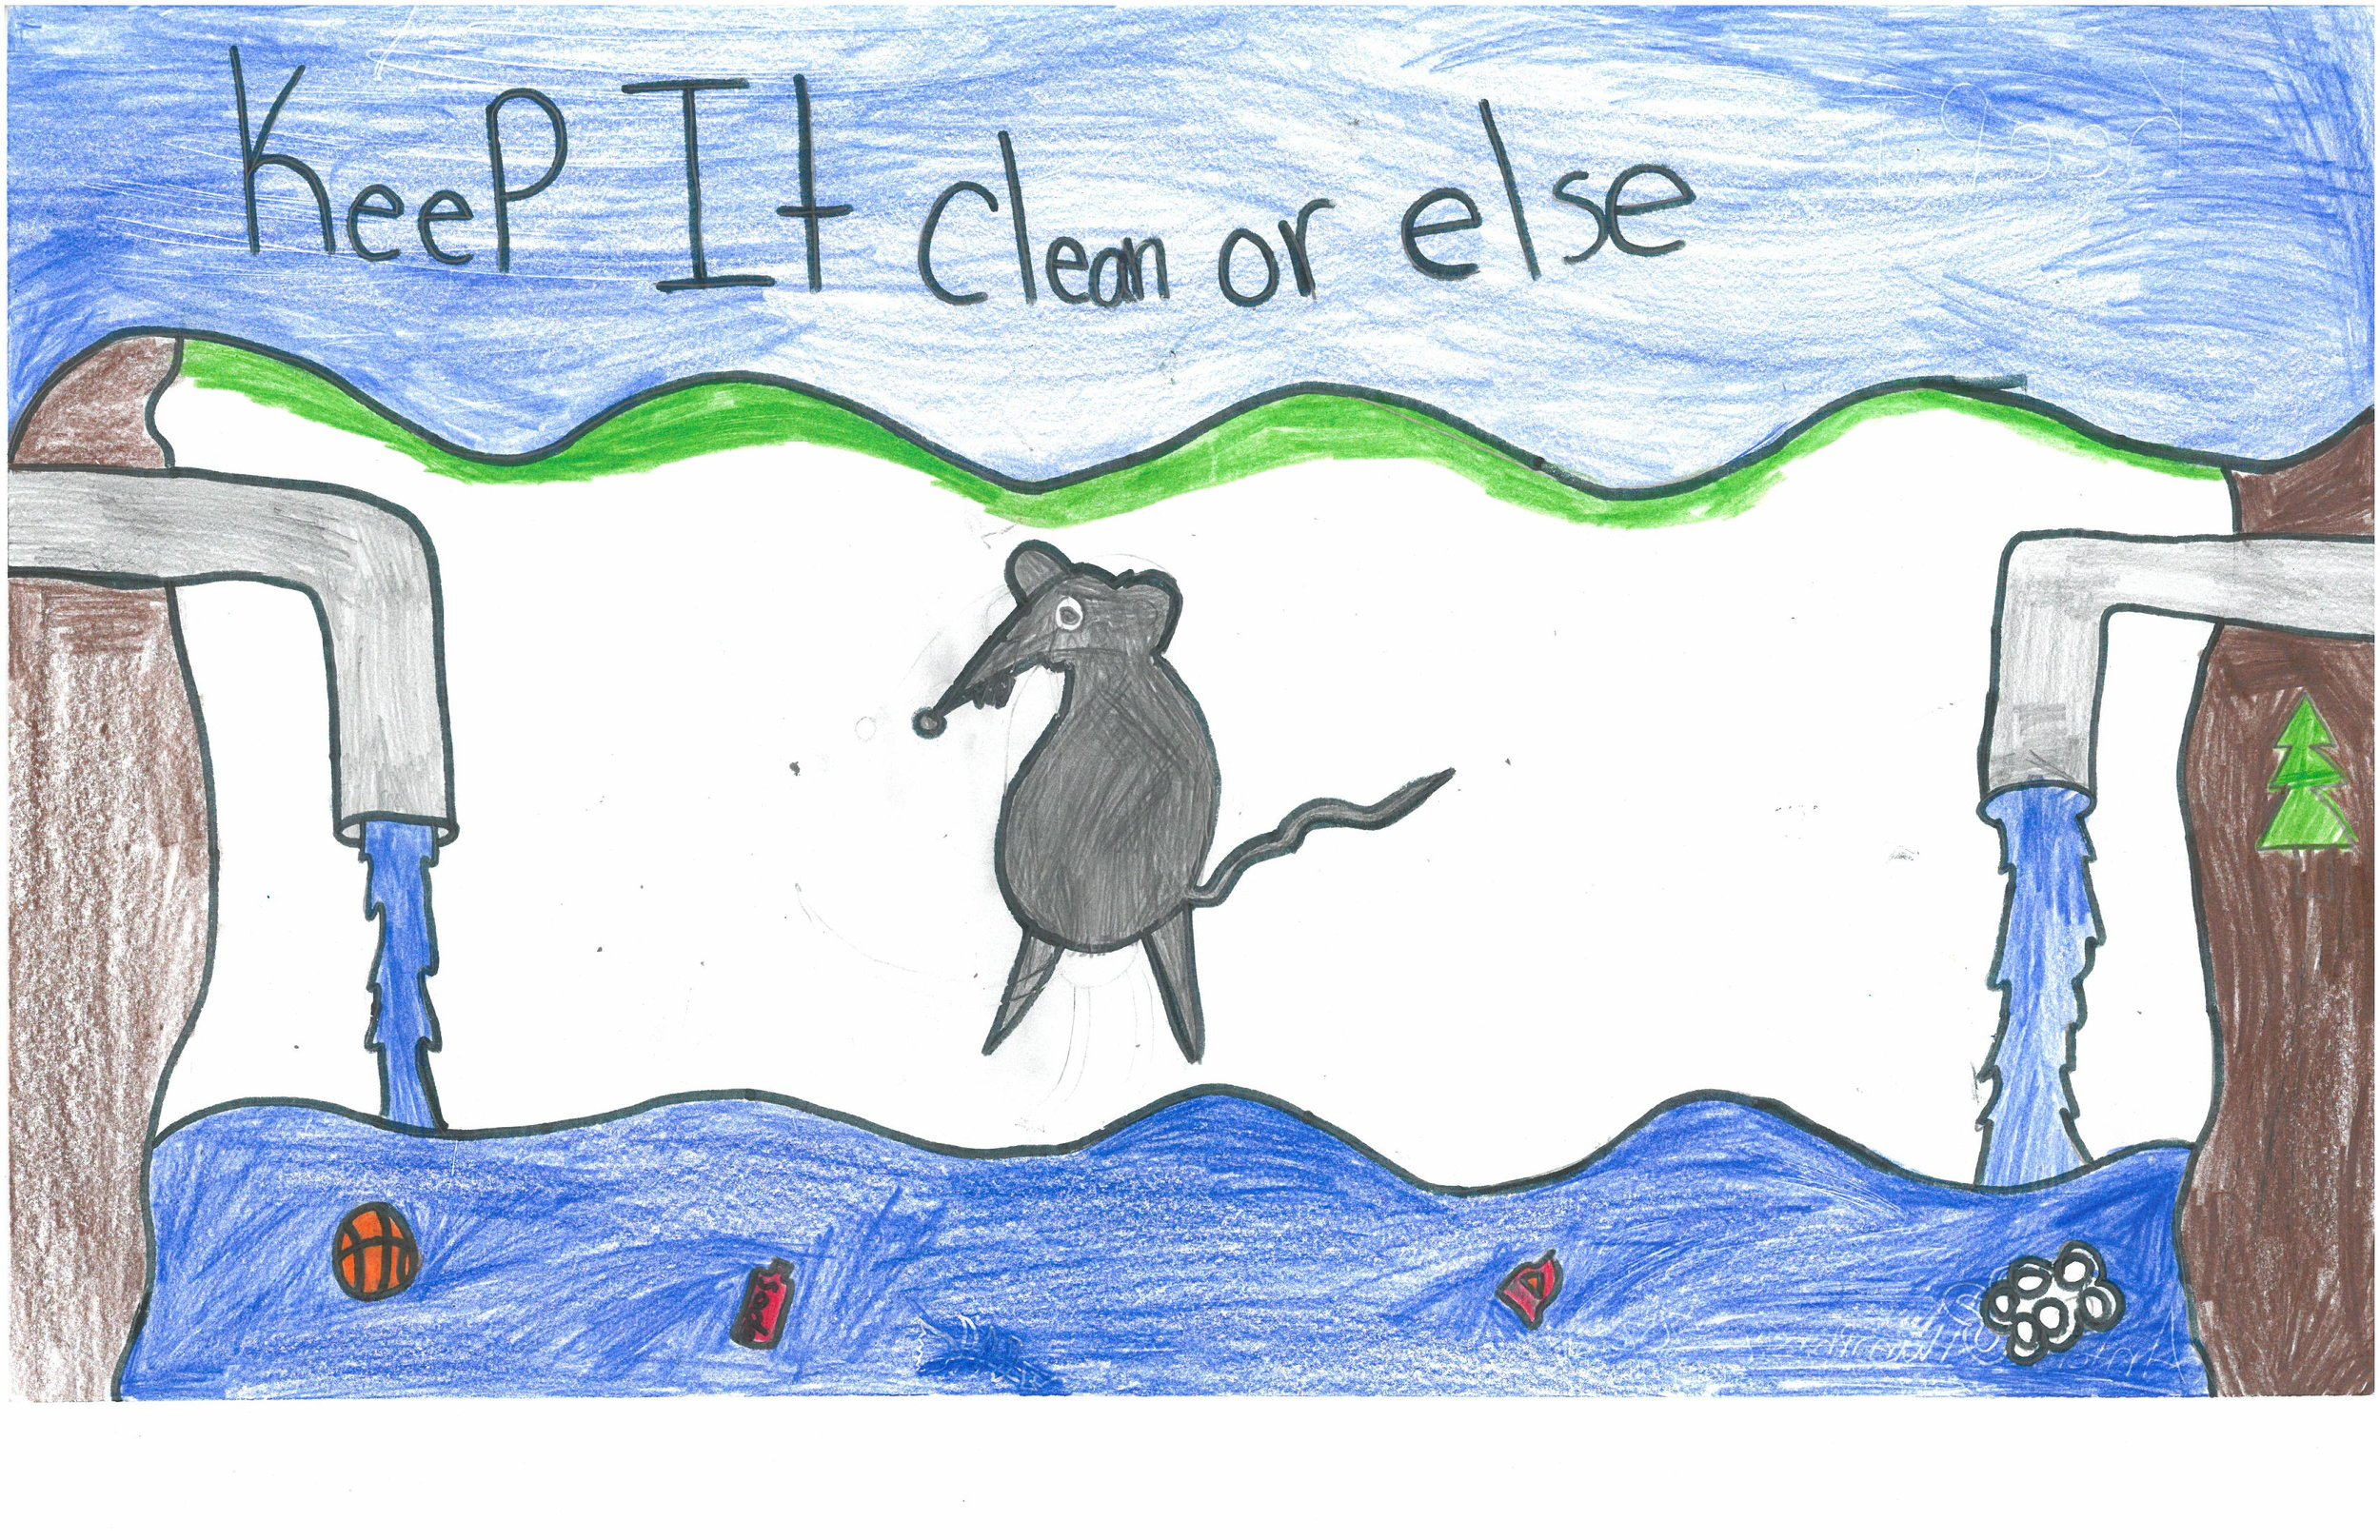 Antonio Humphrey, 5th grader at Sharpe Elem.